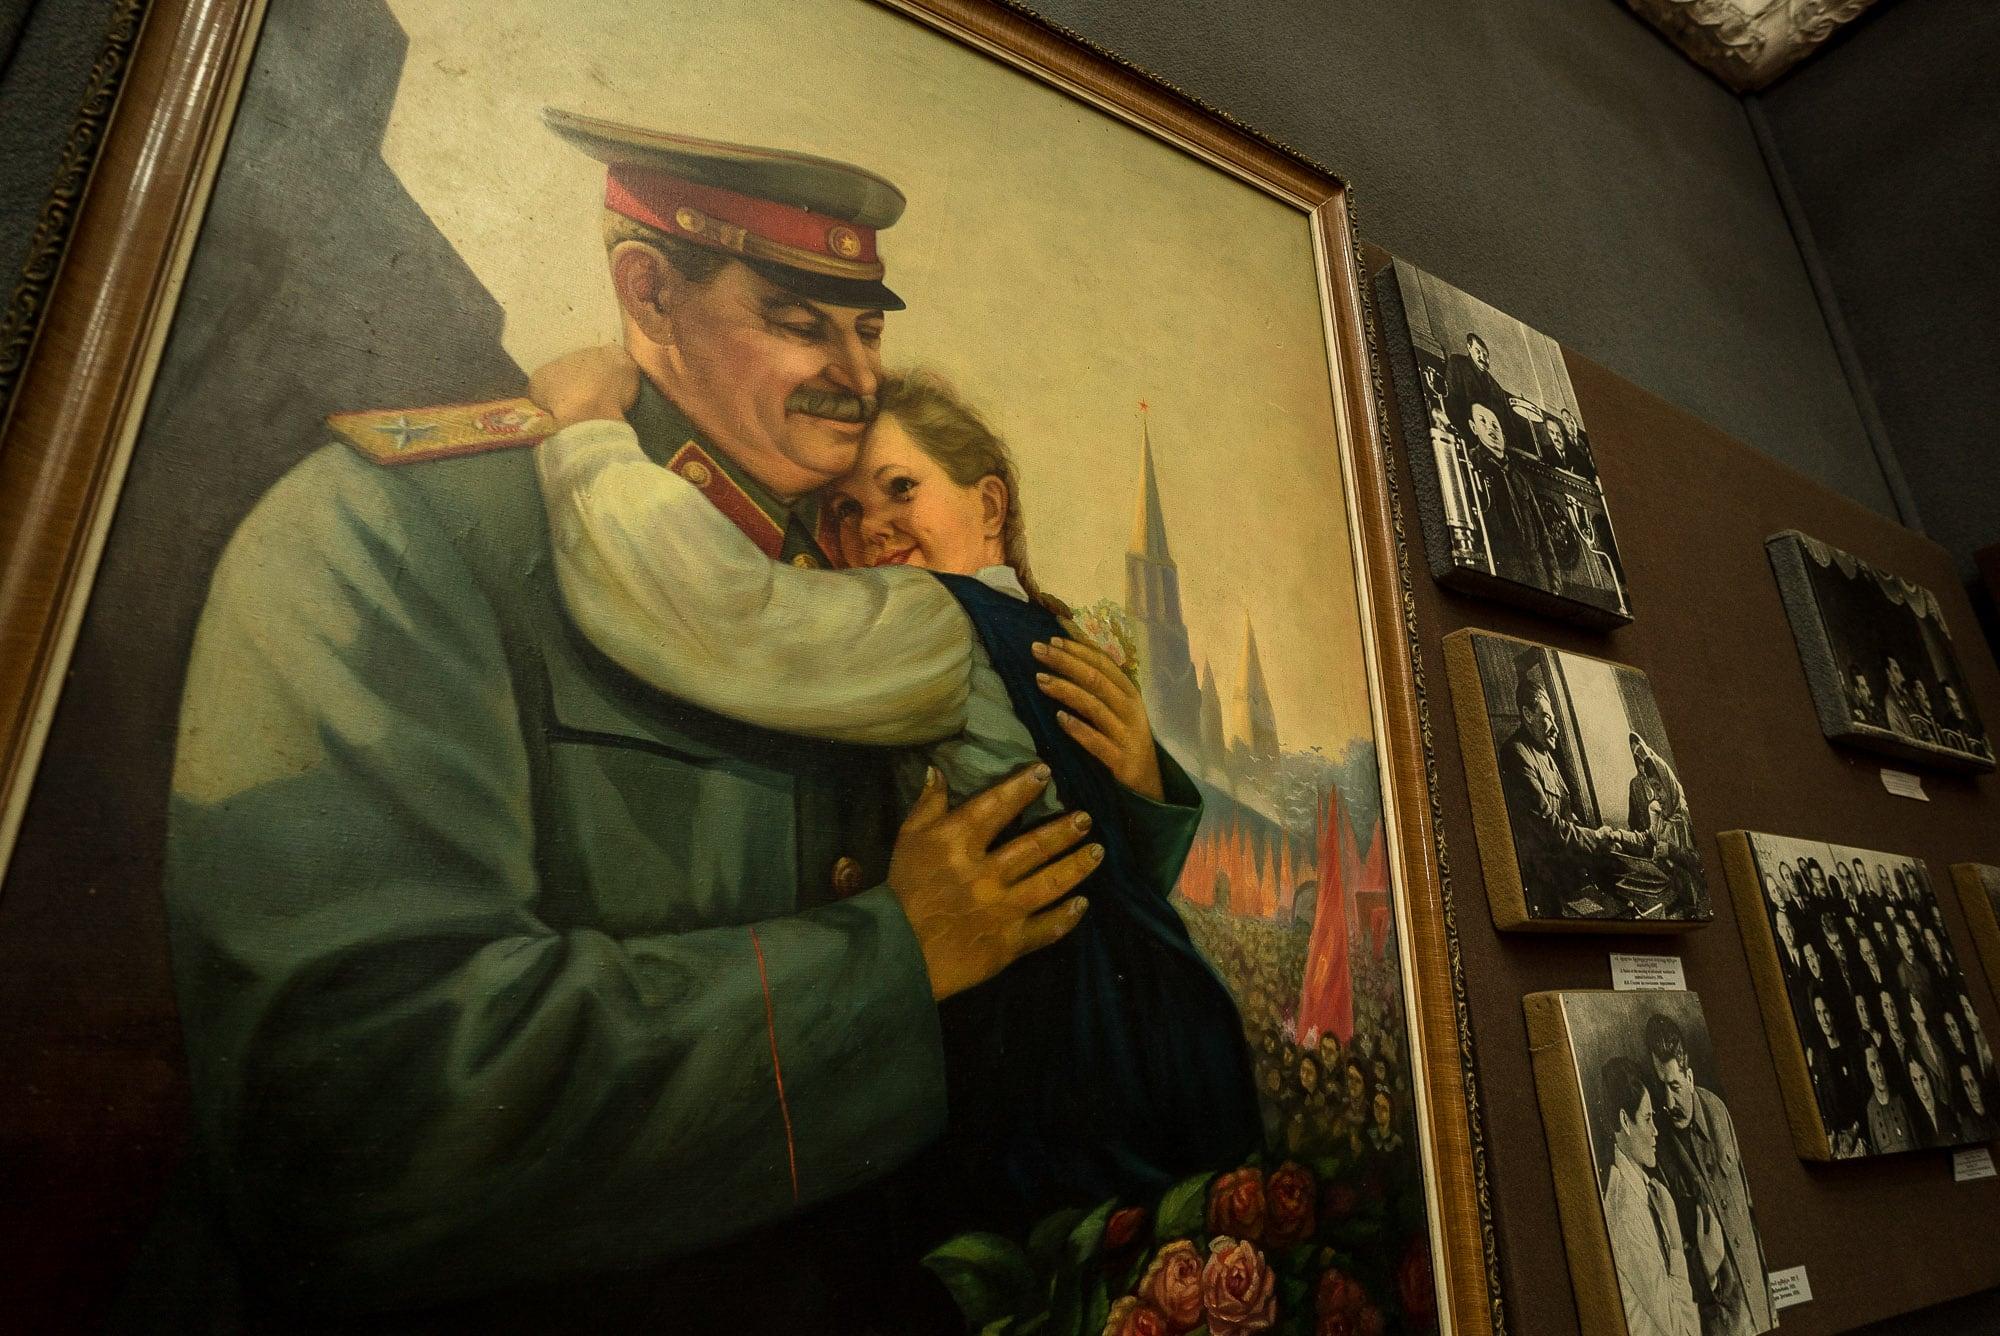 Stalin pics